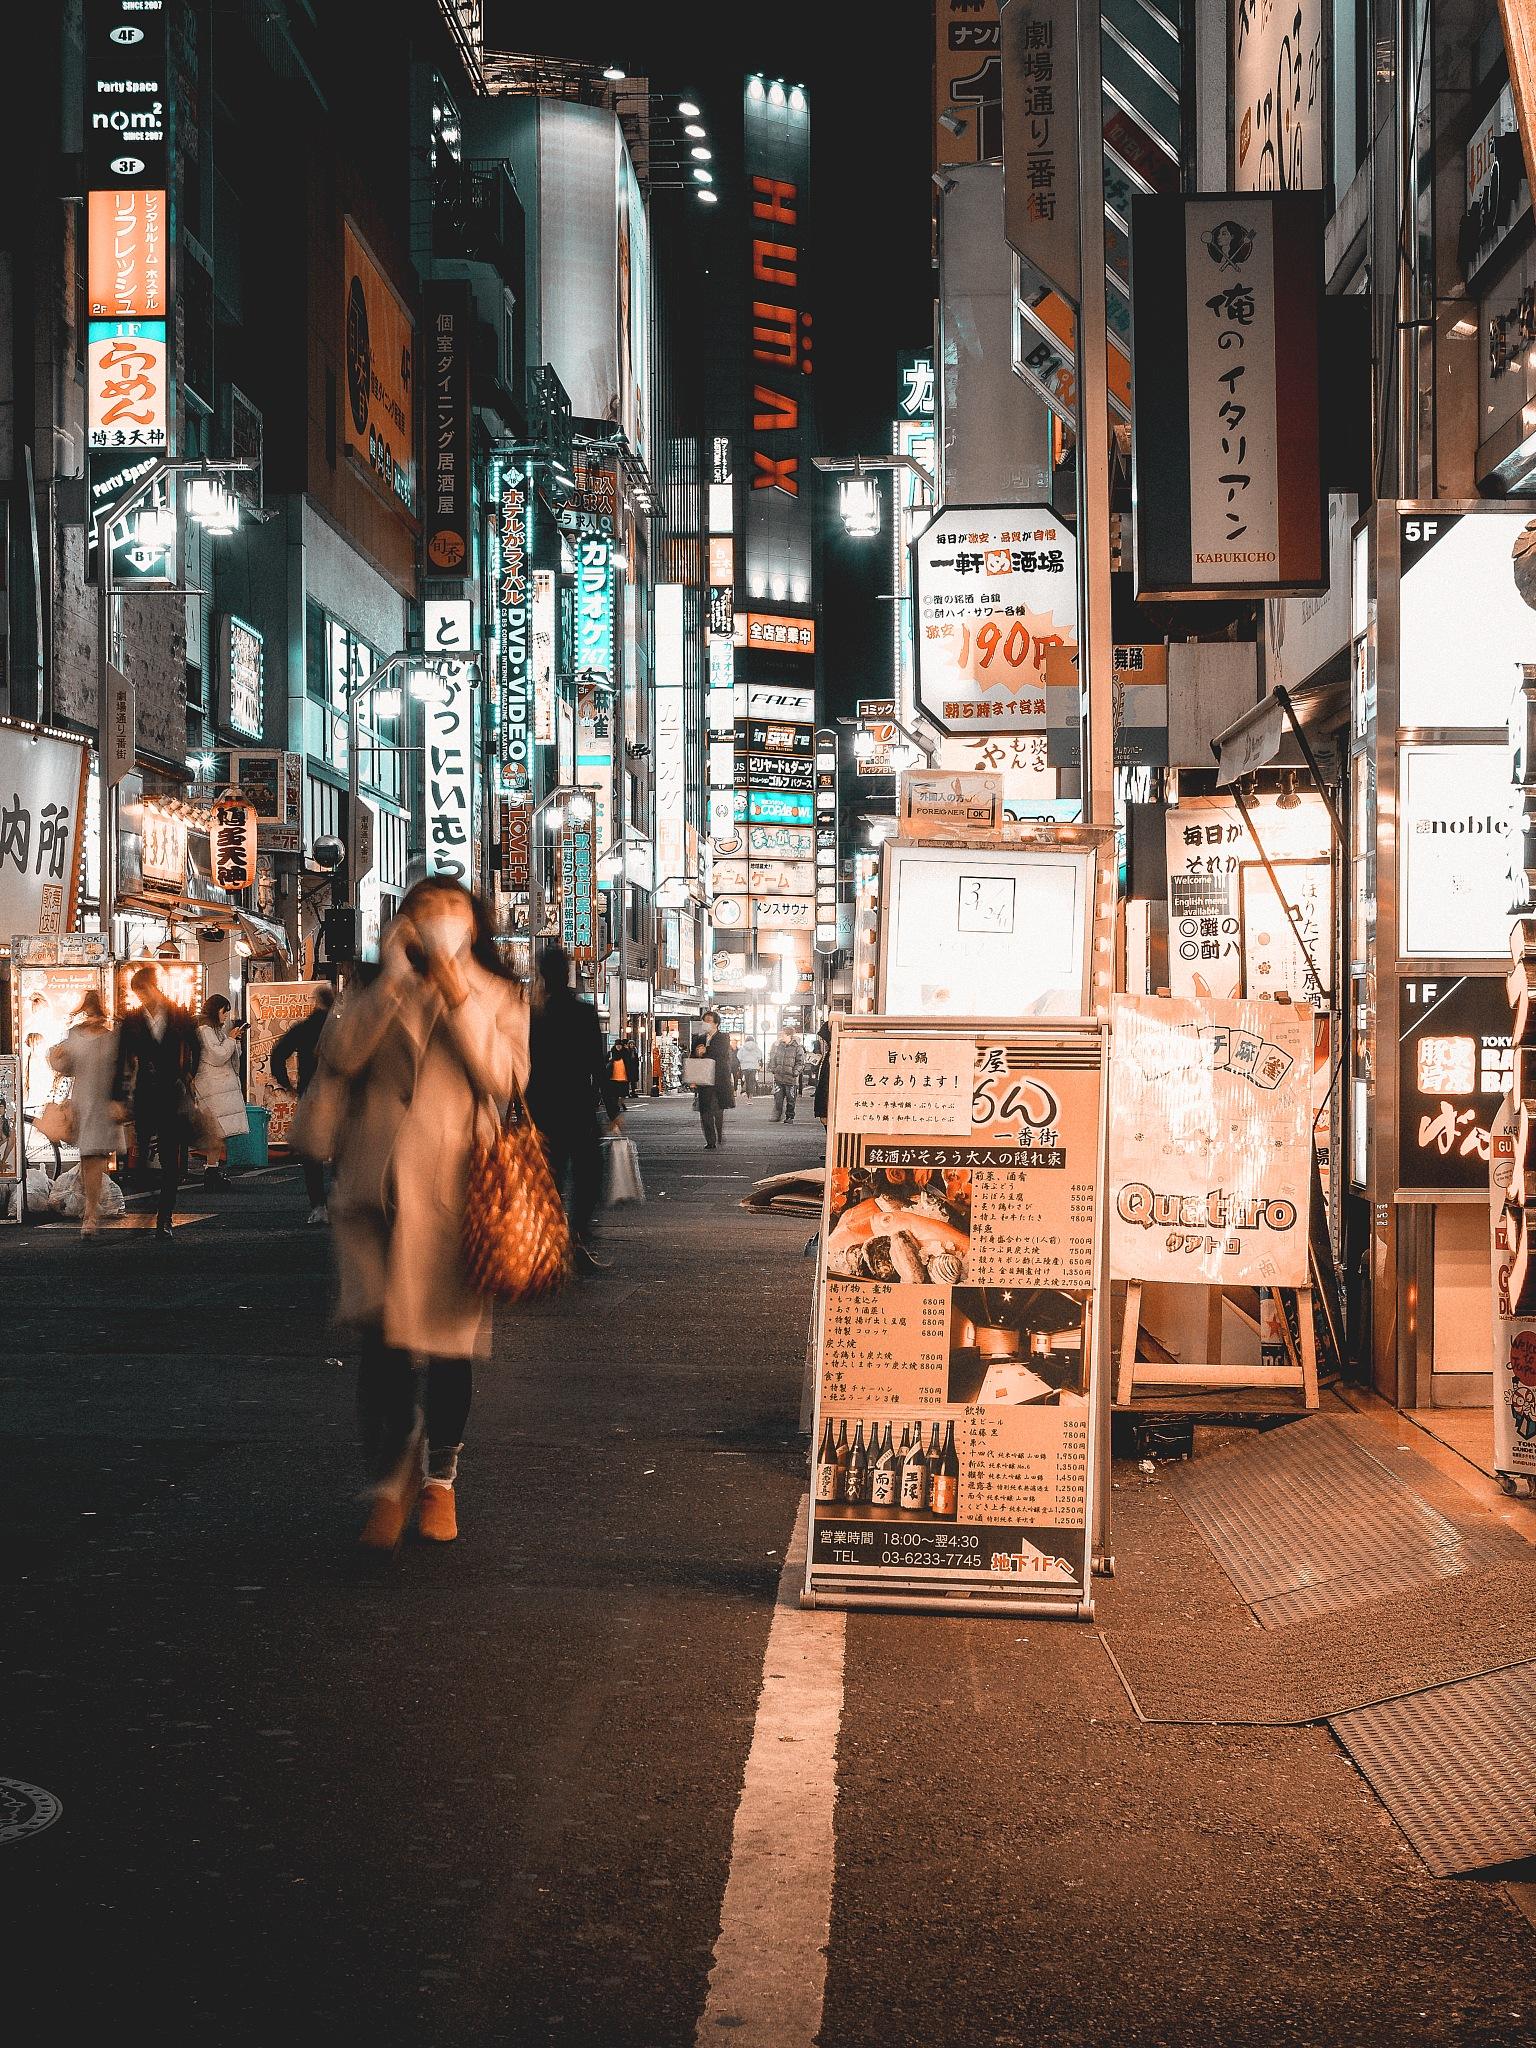 Photo in Street Photography #orange and teal #one night in tokyo #night out #japan #tokyo #tokio #asia #far east #neon light #lights #people #shinjuku